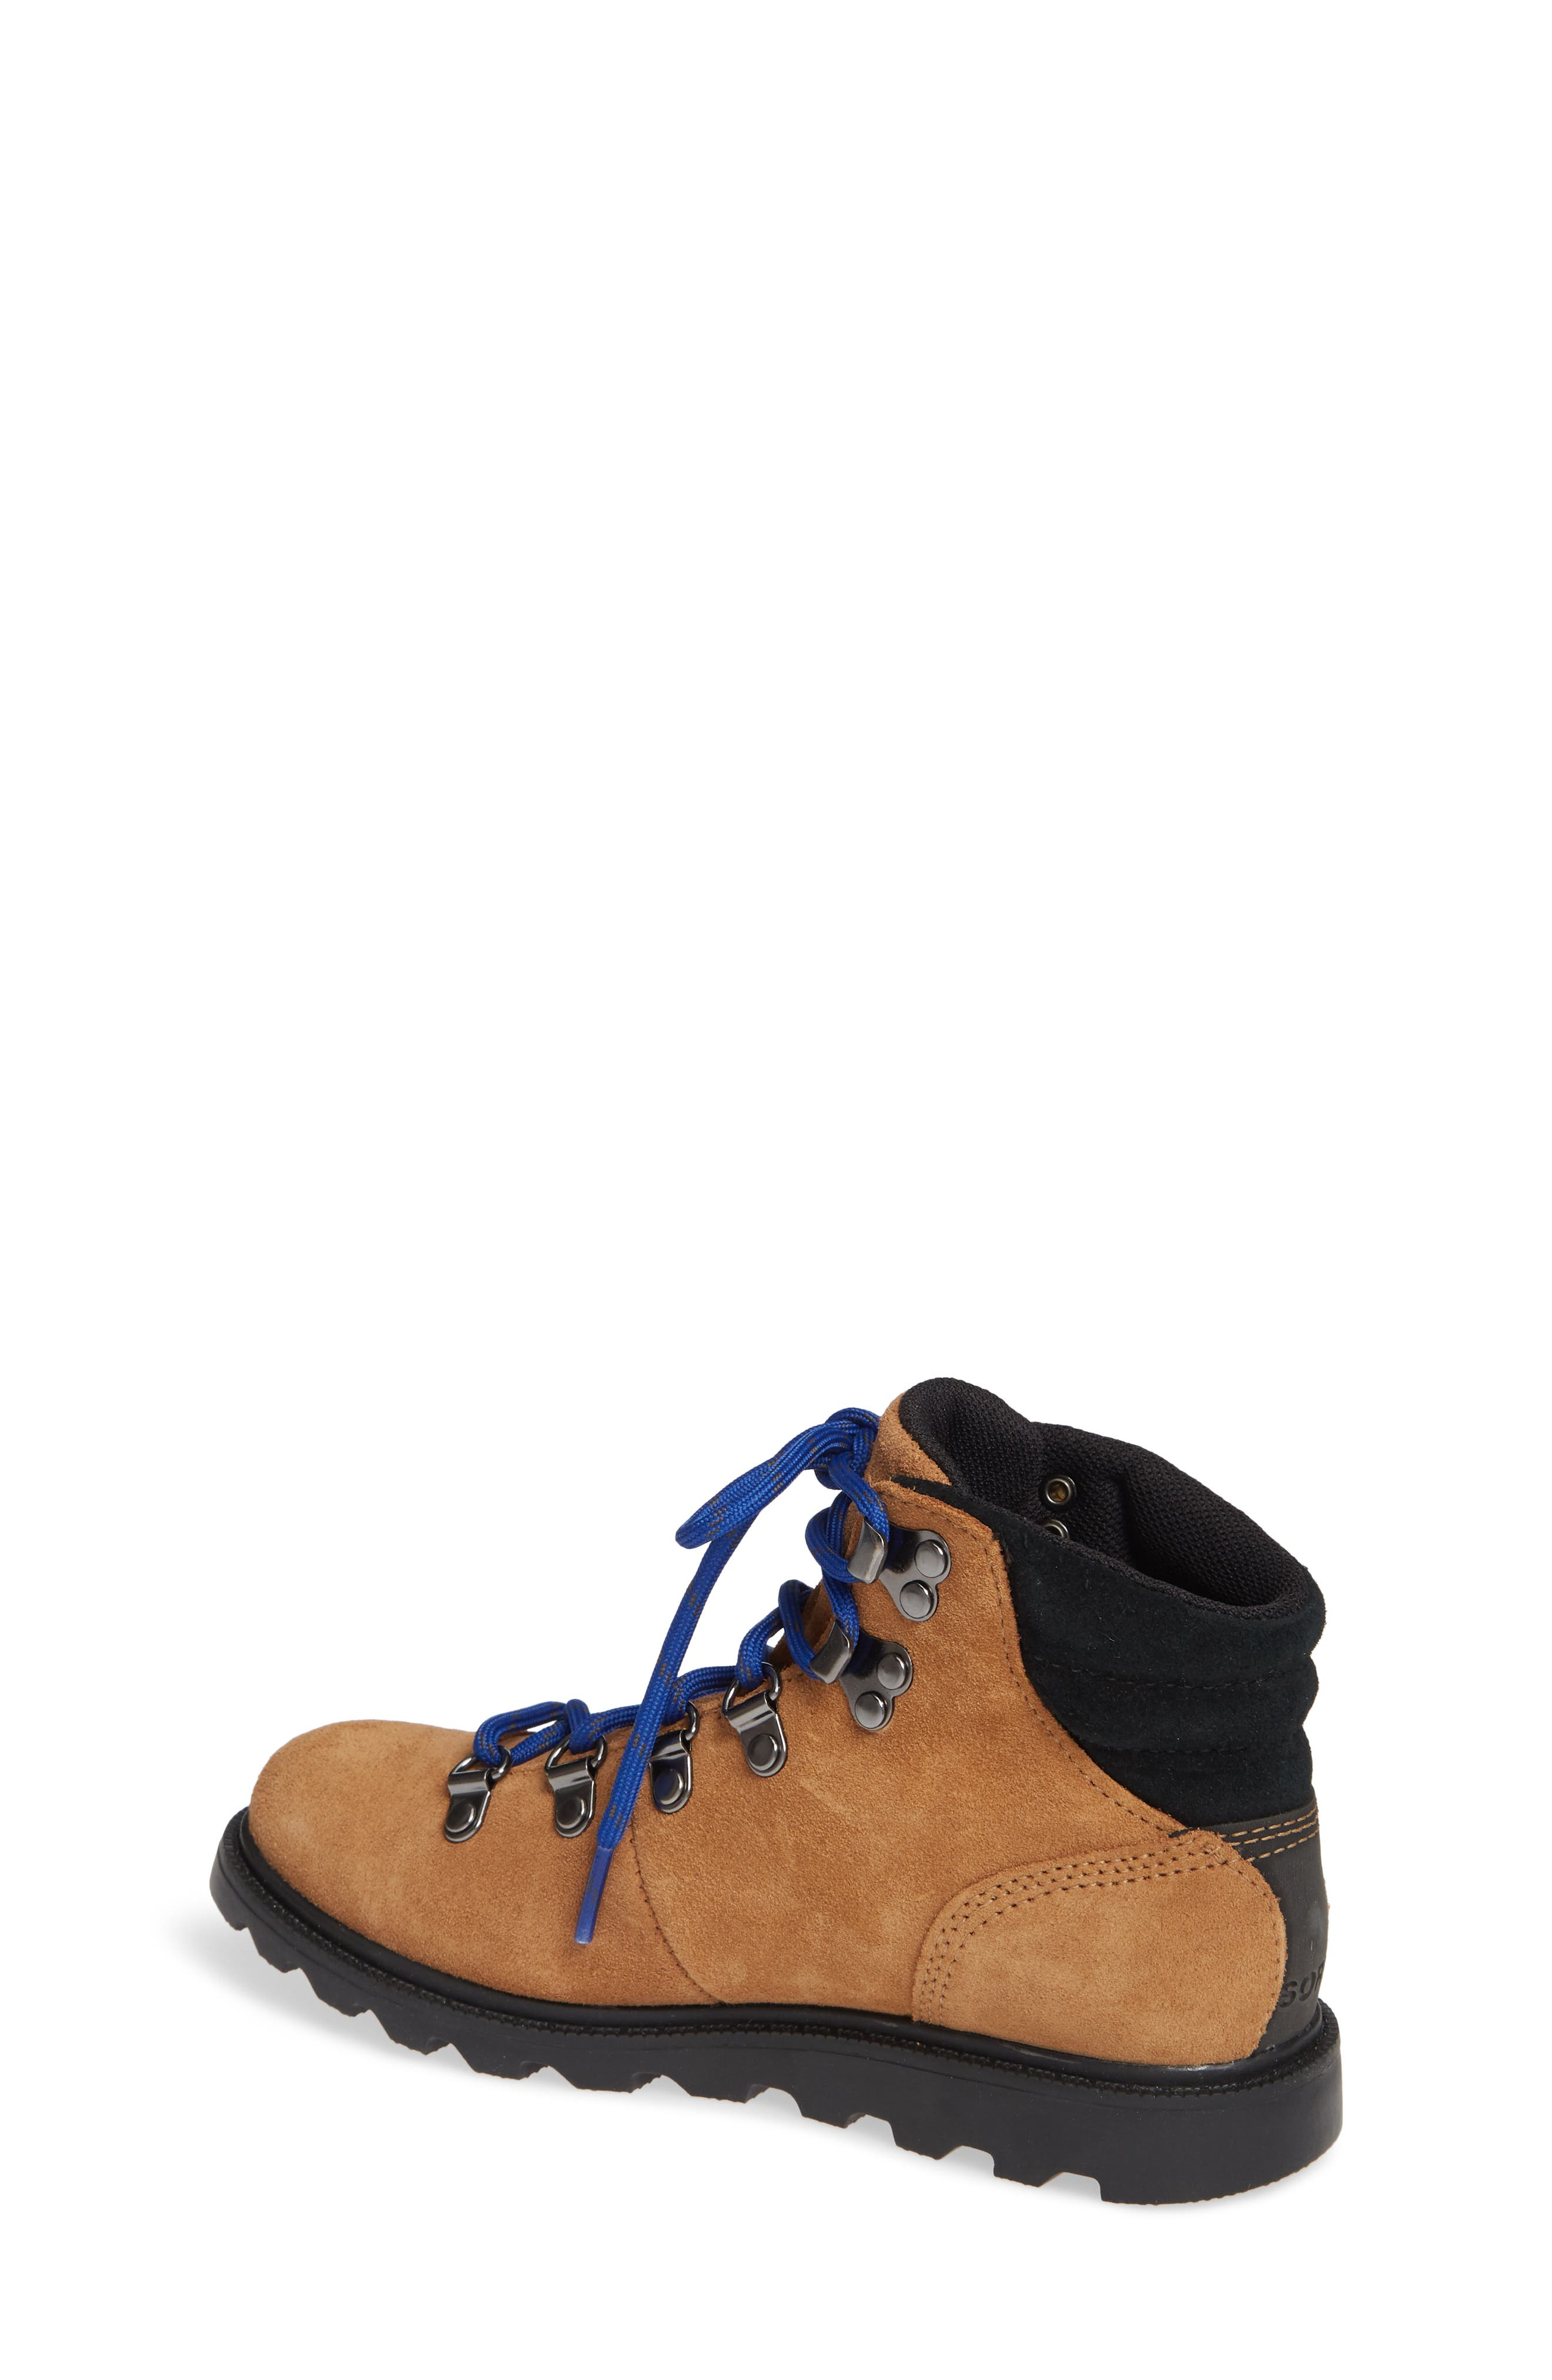 Madison Waterproof Hiker Boot,                             Alternate thumbnail 2, color,                             CAMEL BROWN/ BLACK